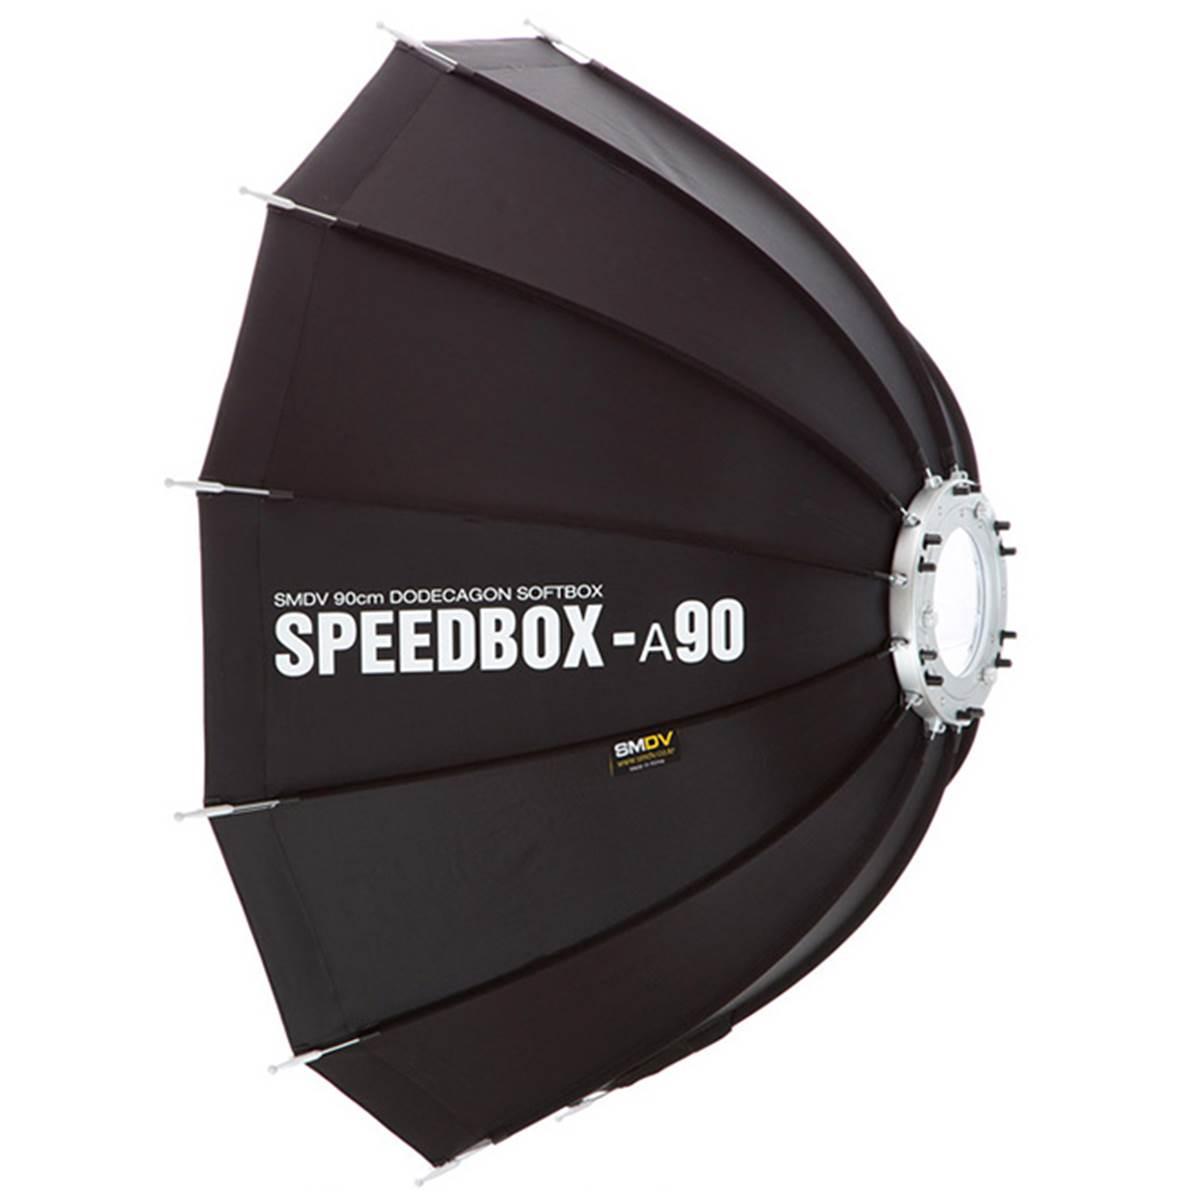 smdv bo te lumi re sb a90 speedbox 90cm pour briht 360 prophot. Black Bedroom Furniture Sets. Home Design Ideas